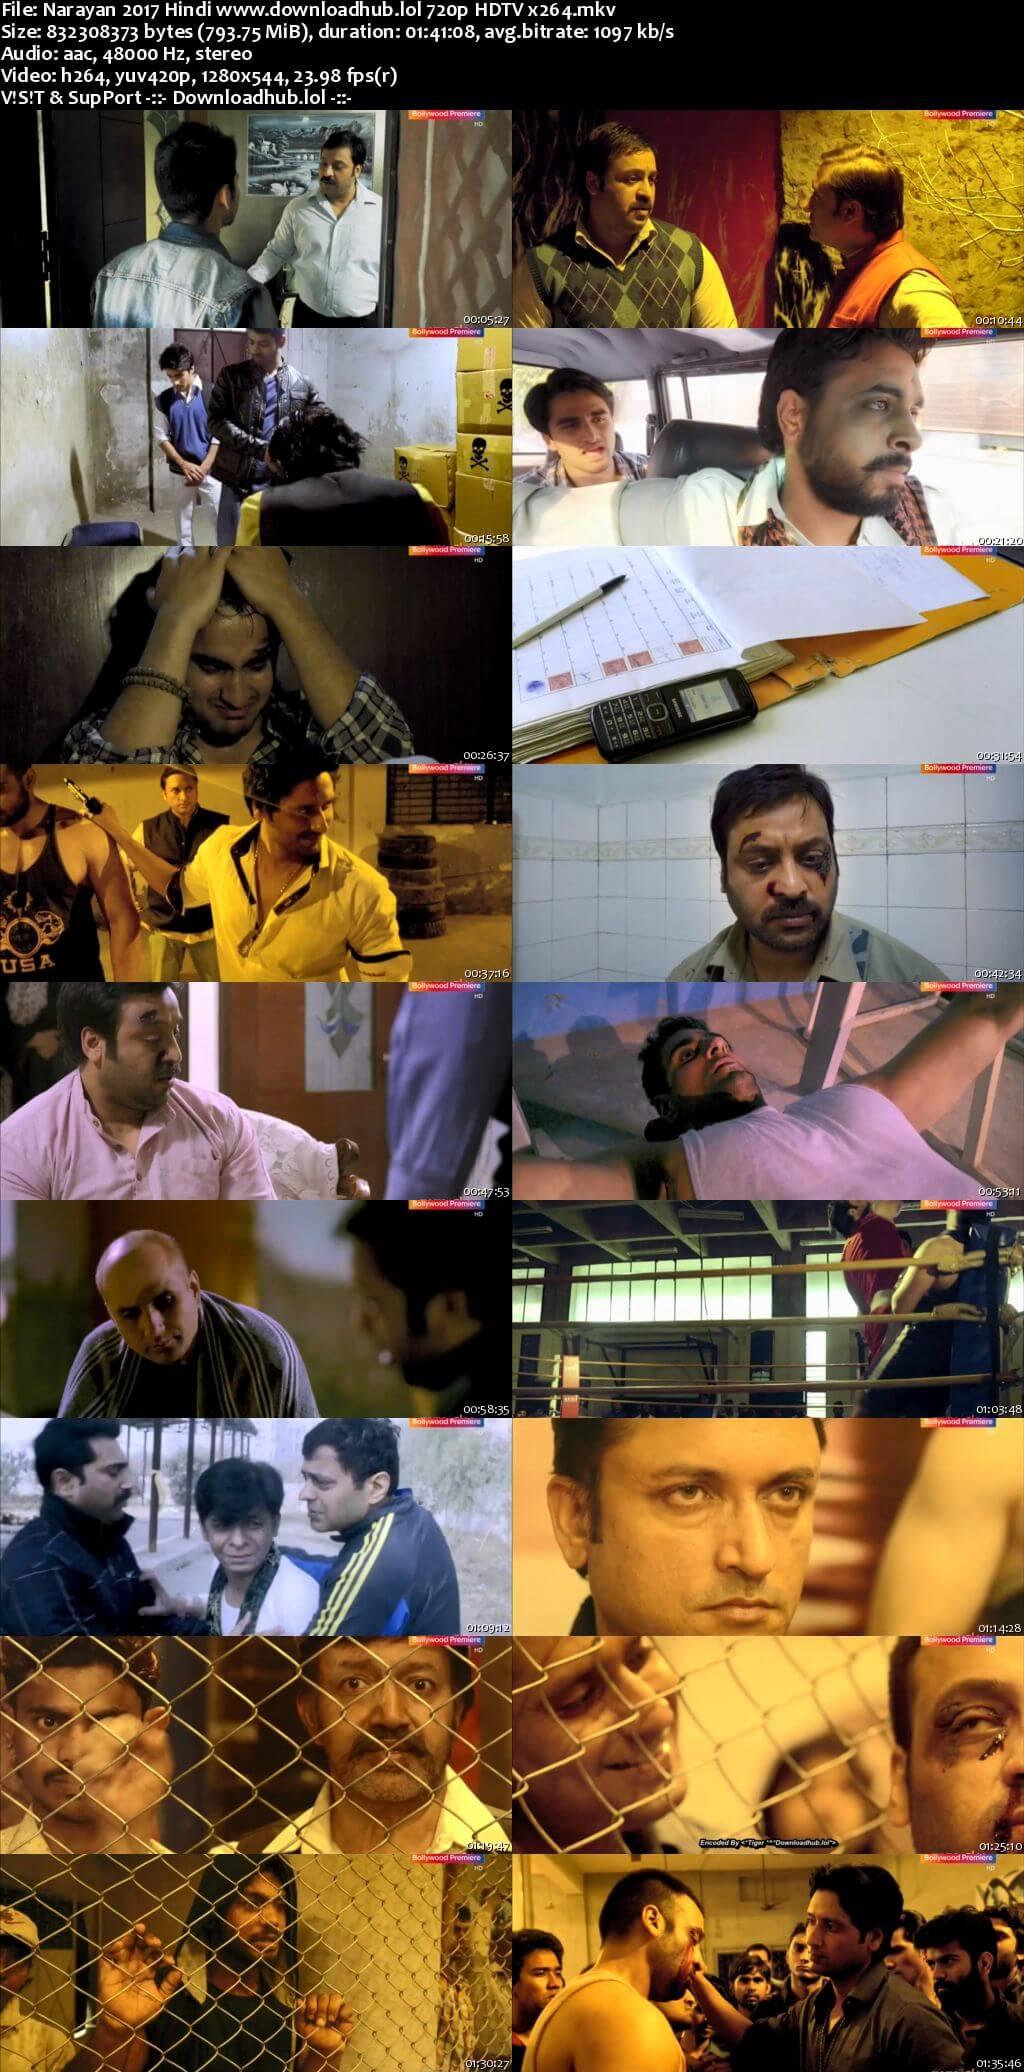 Narayan 2017 Hindi 720p HDTV x264